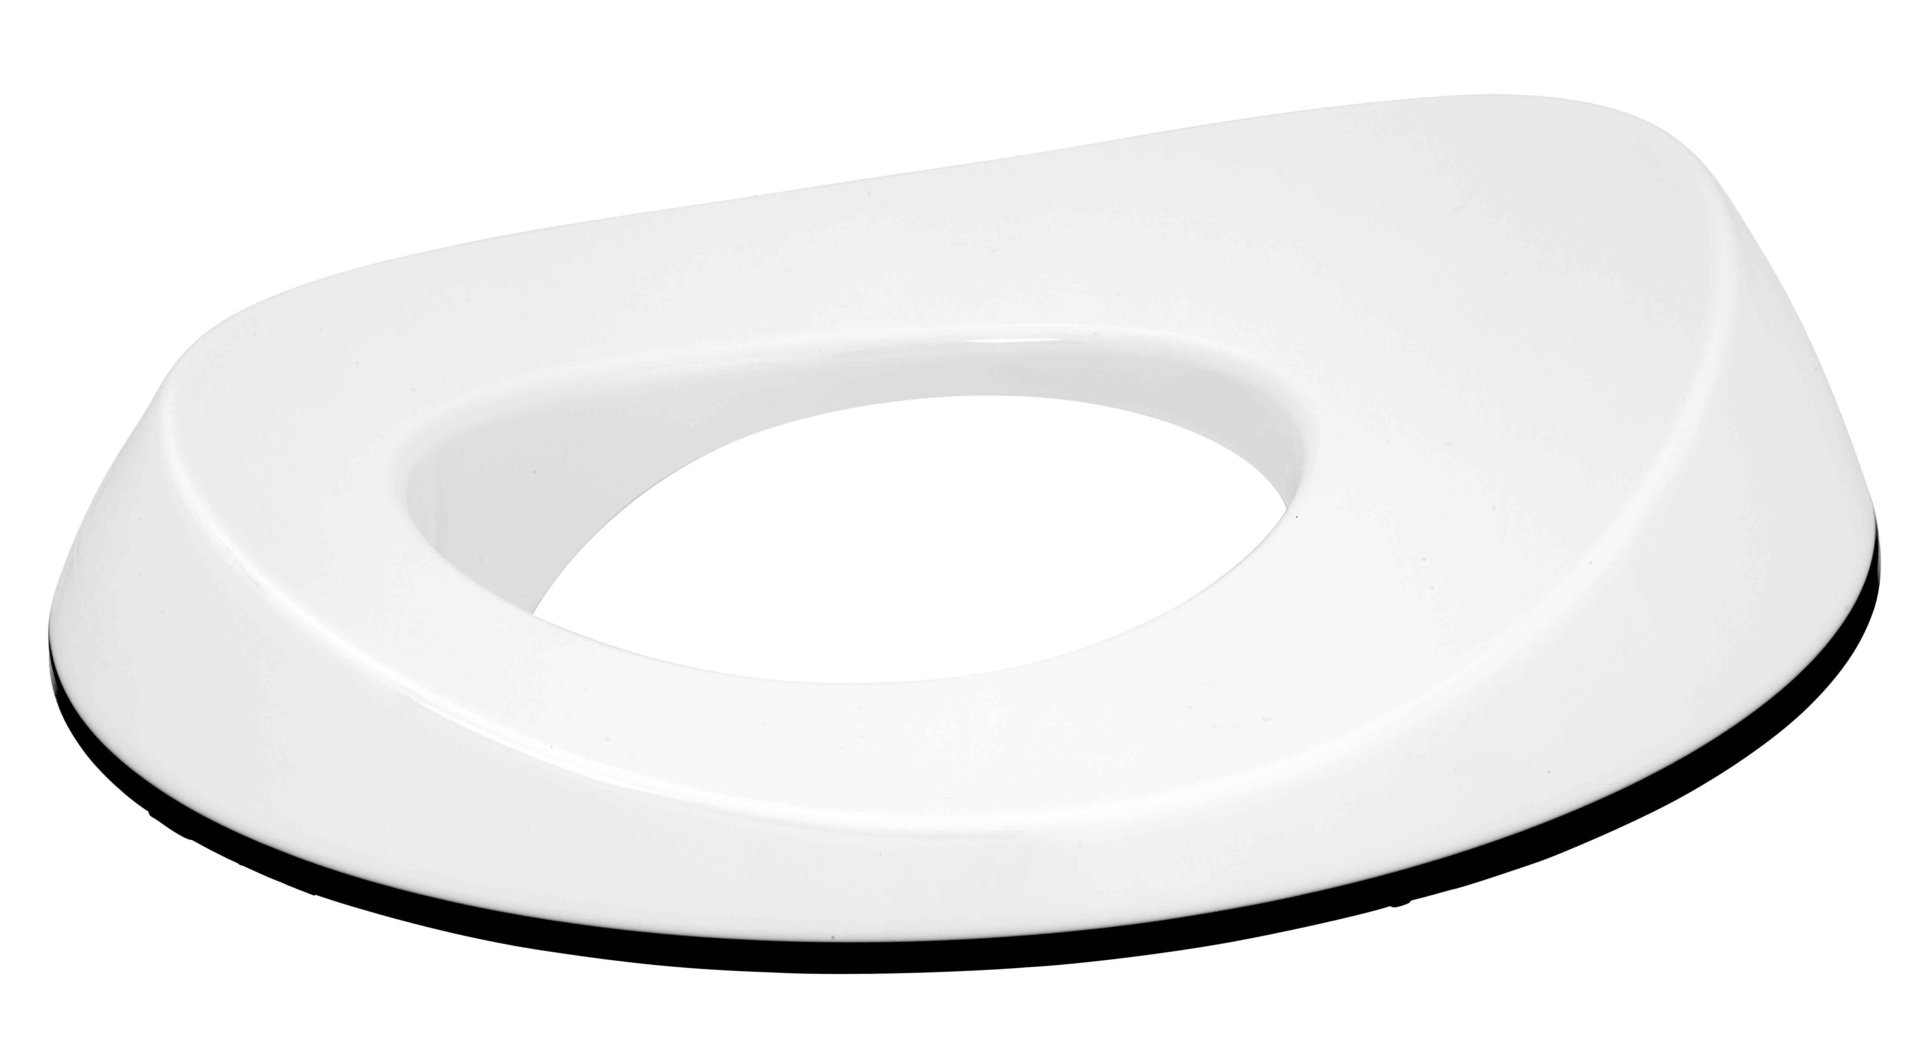 Set De Baño Infantil:para baño infantil snow white adaptador para baño para los peques de